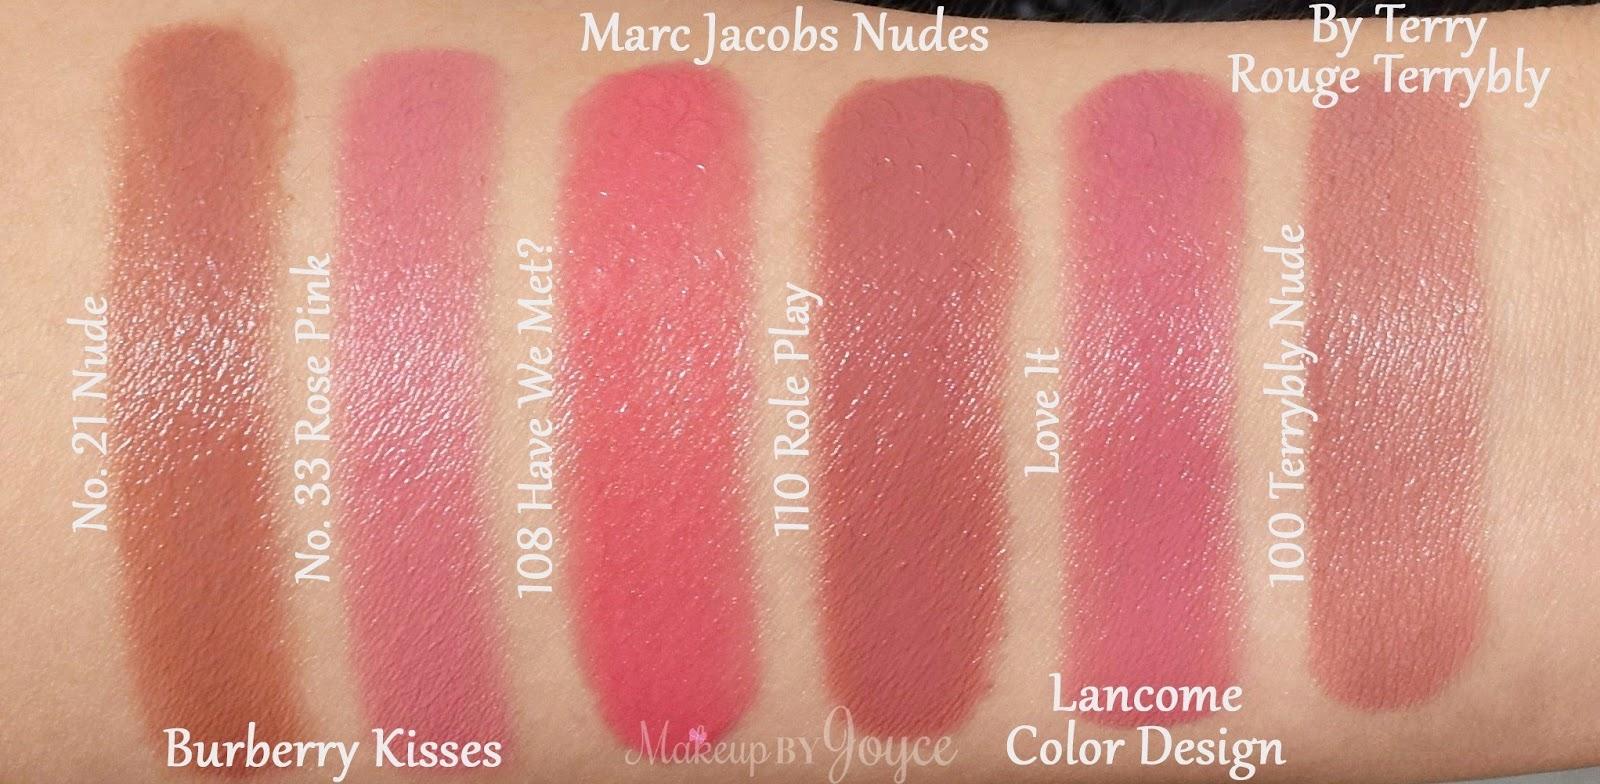 Color Design Sensational Effects Eyeshadow by Lancôme #6